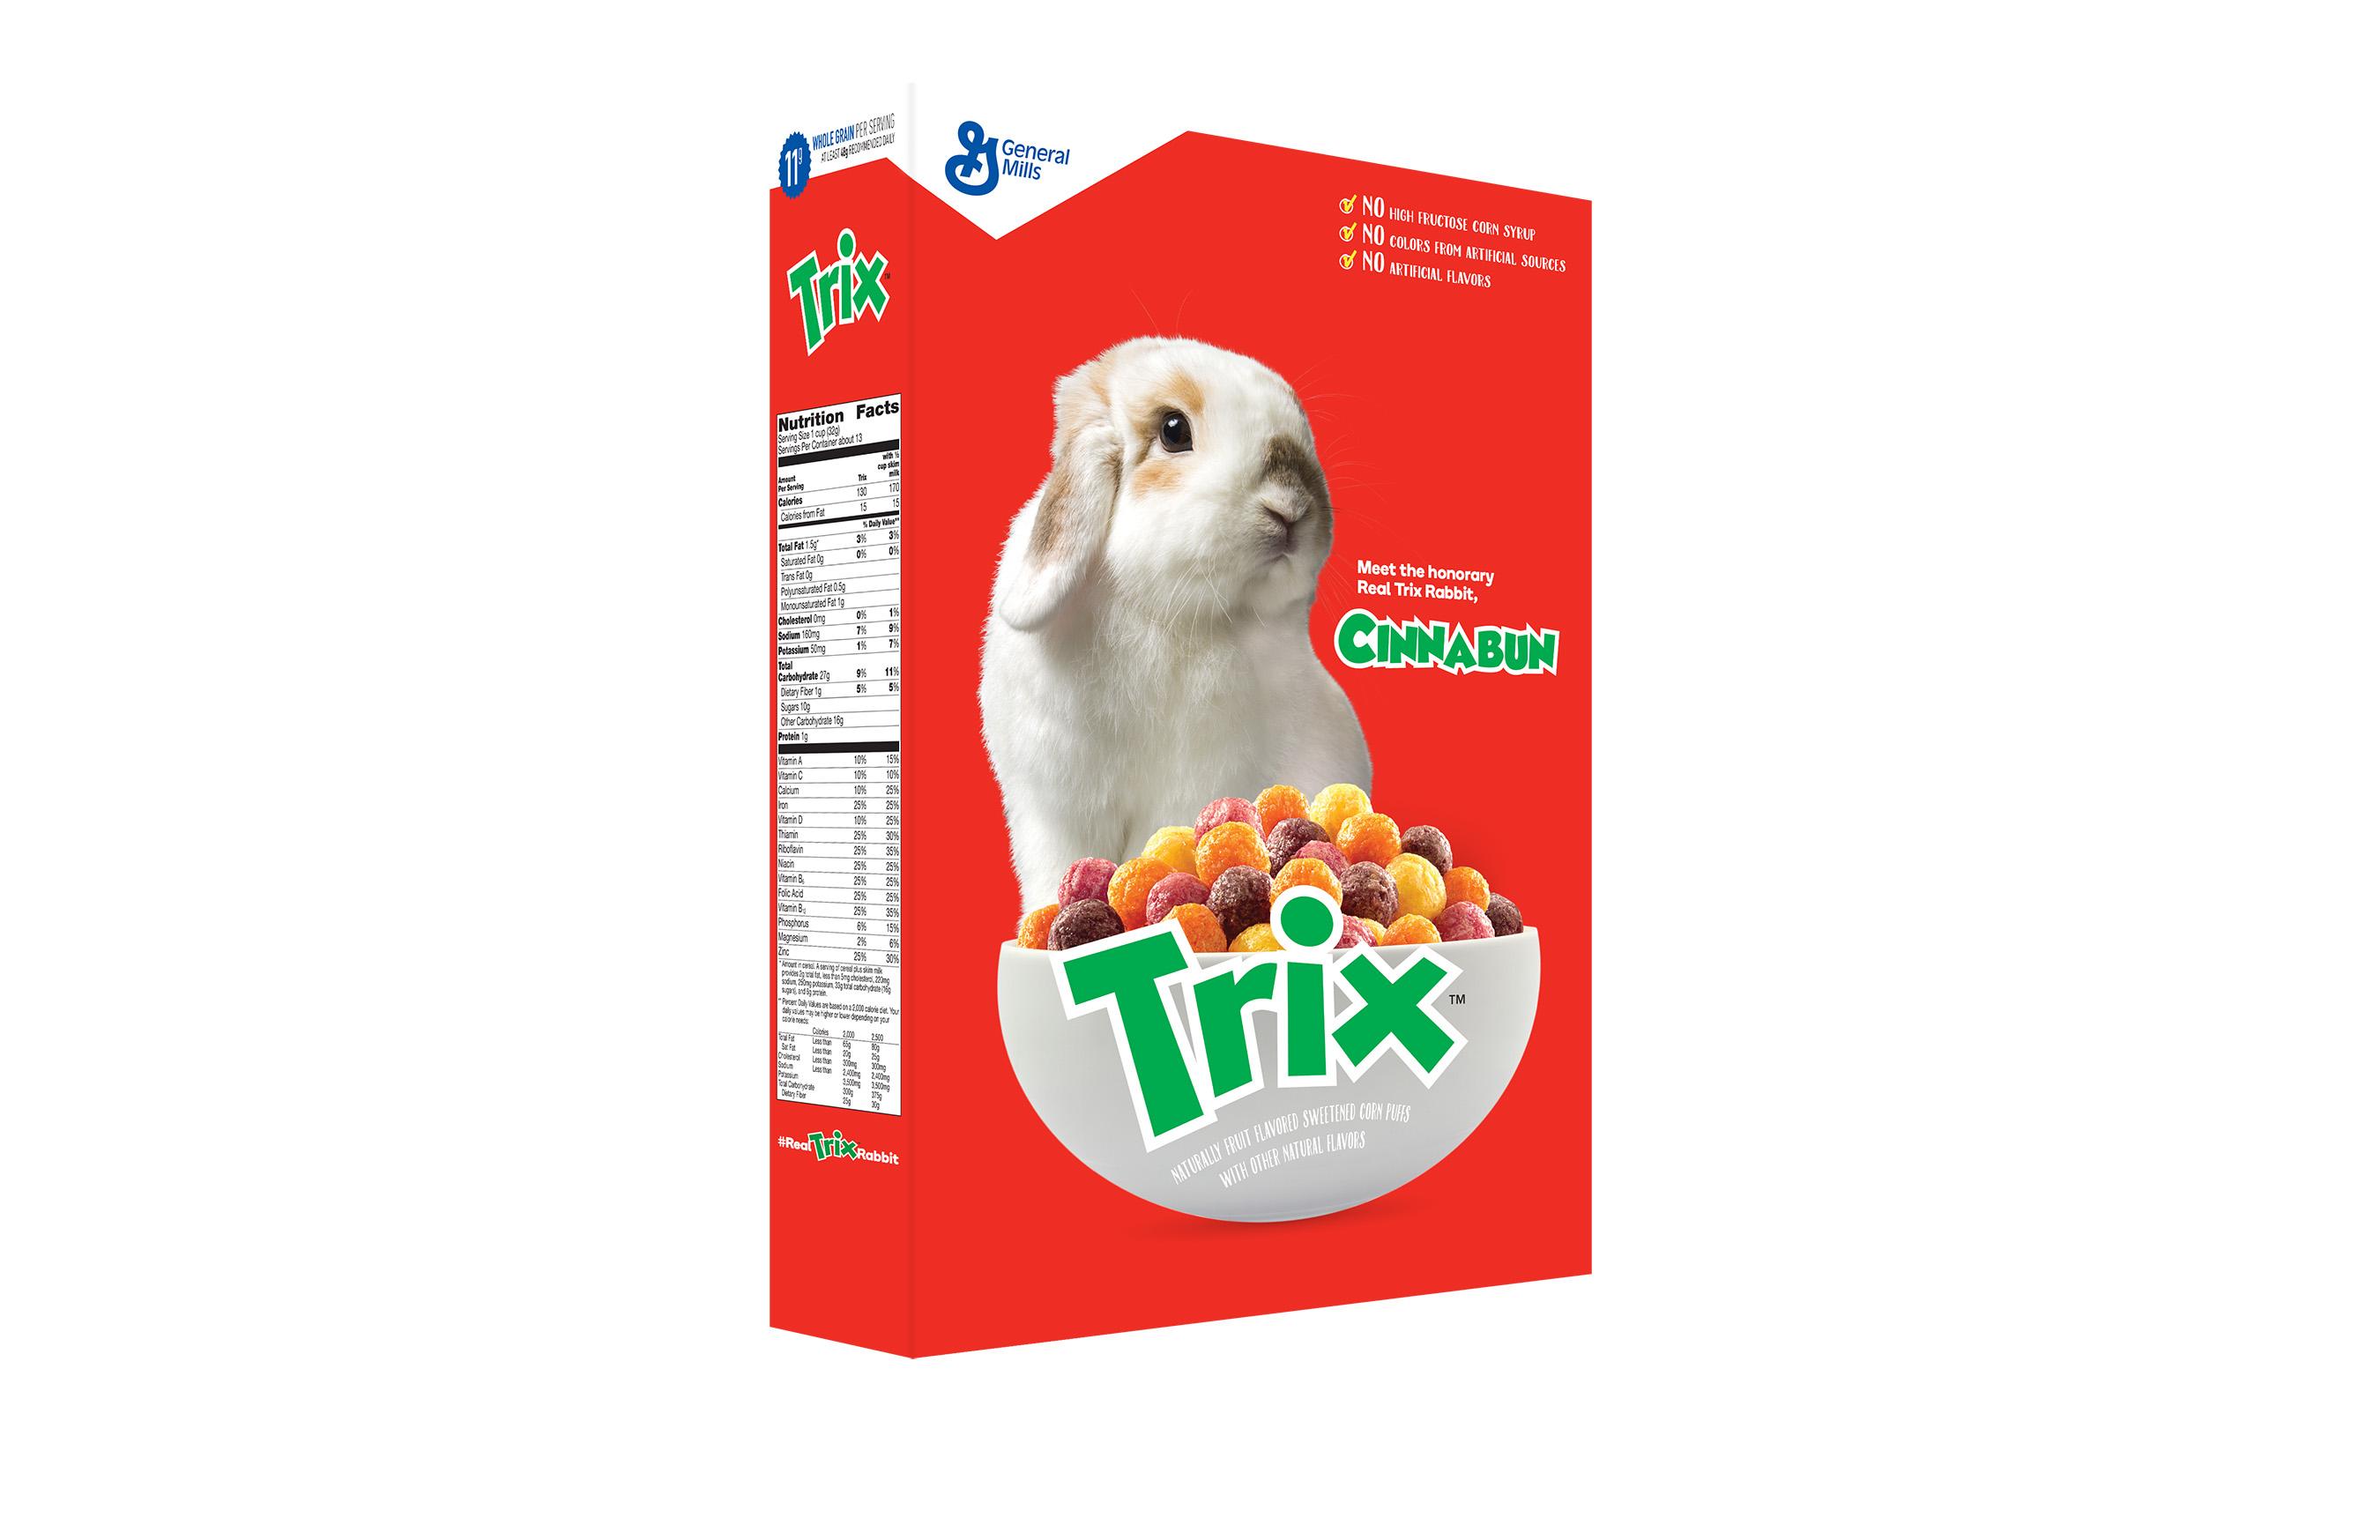 #RealTrixRabbit Box Cutout